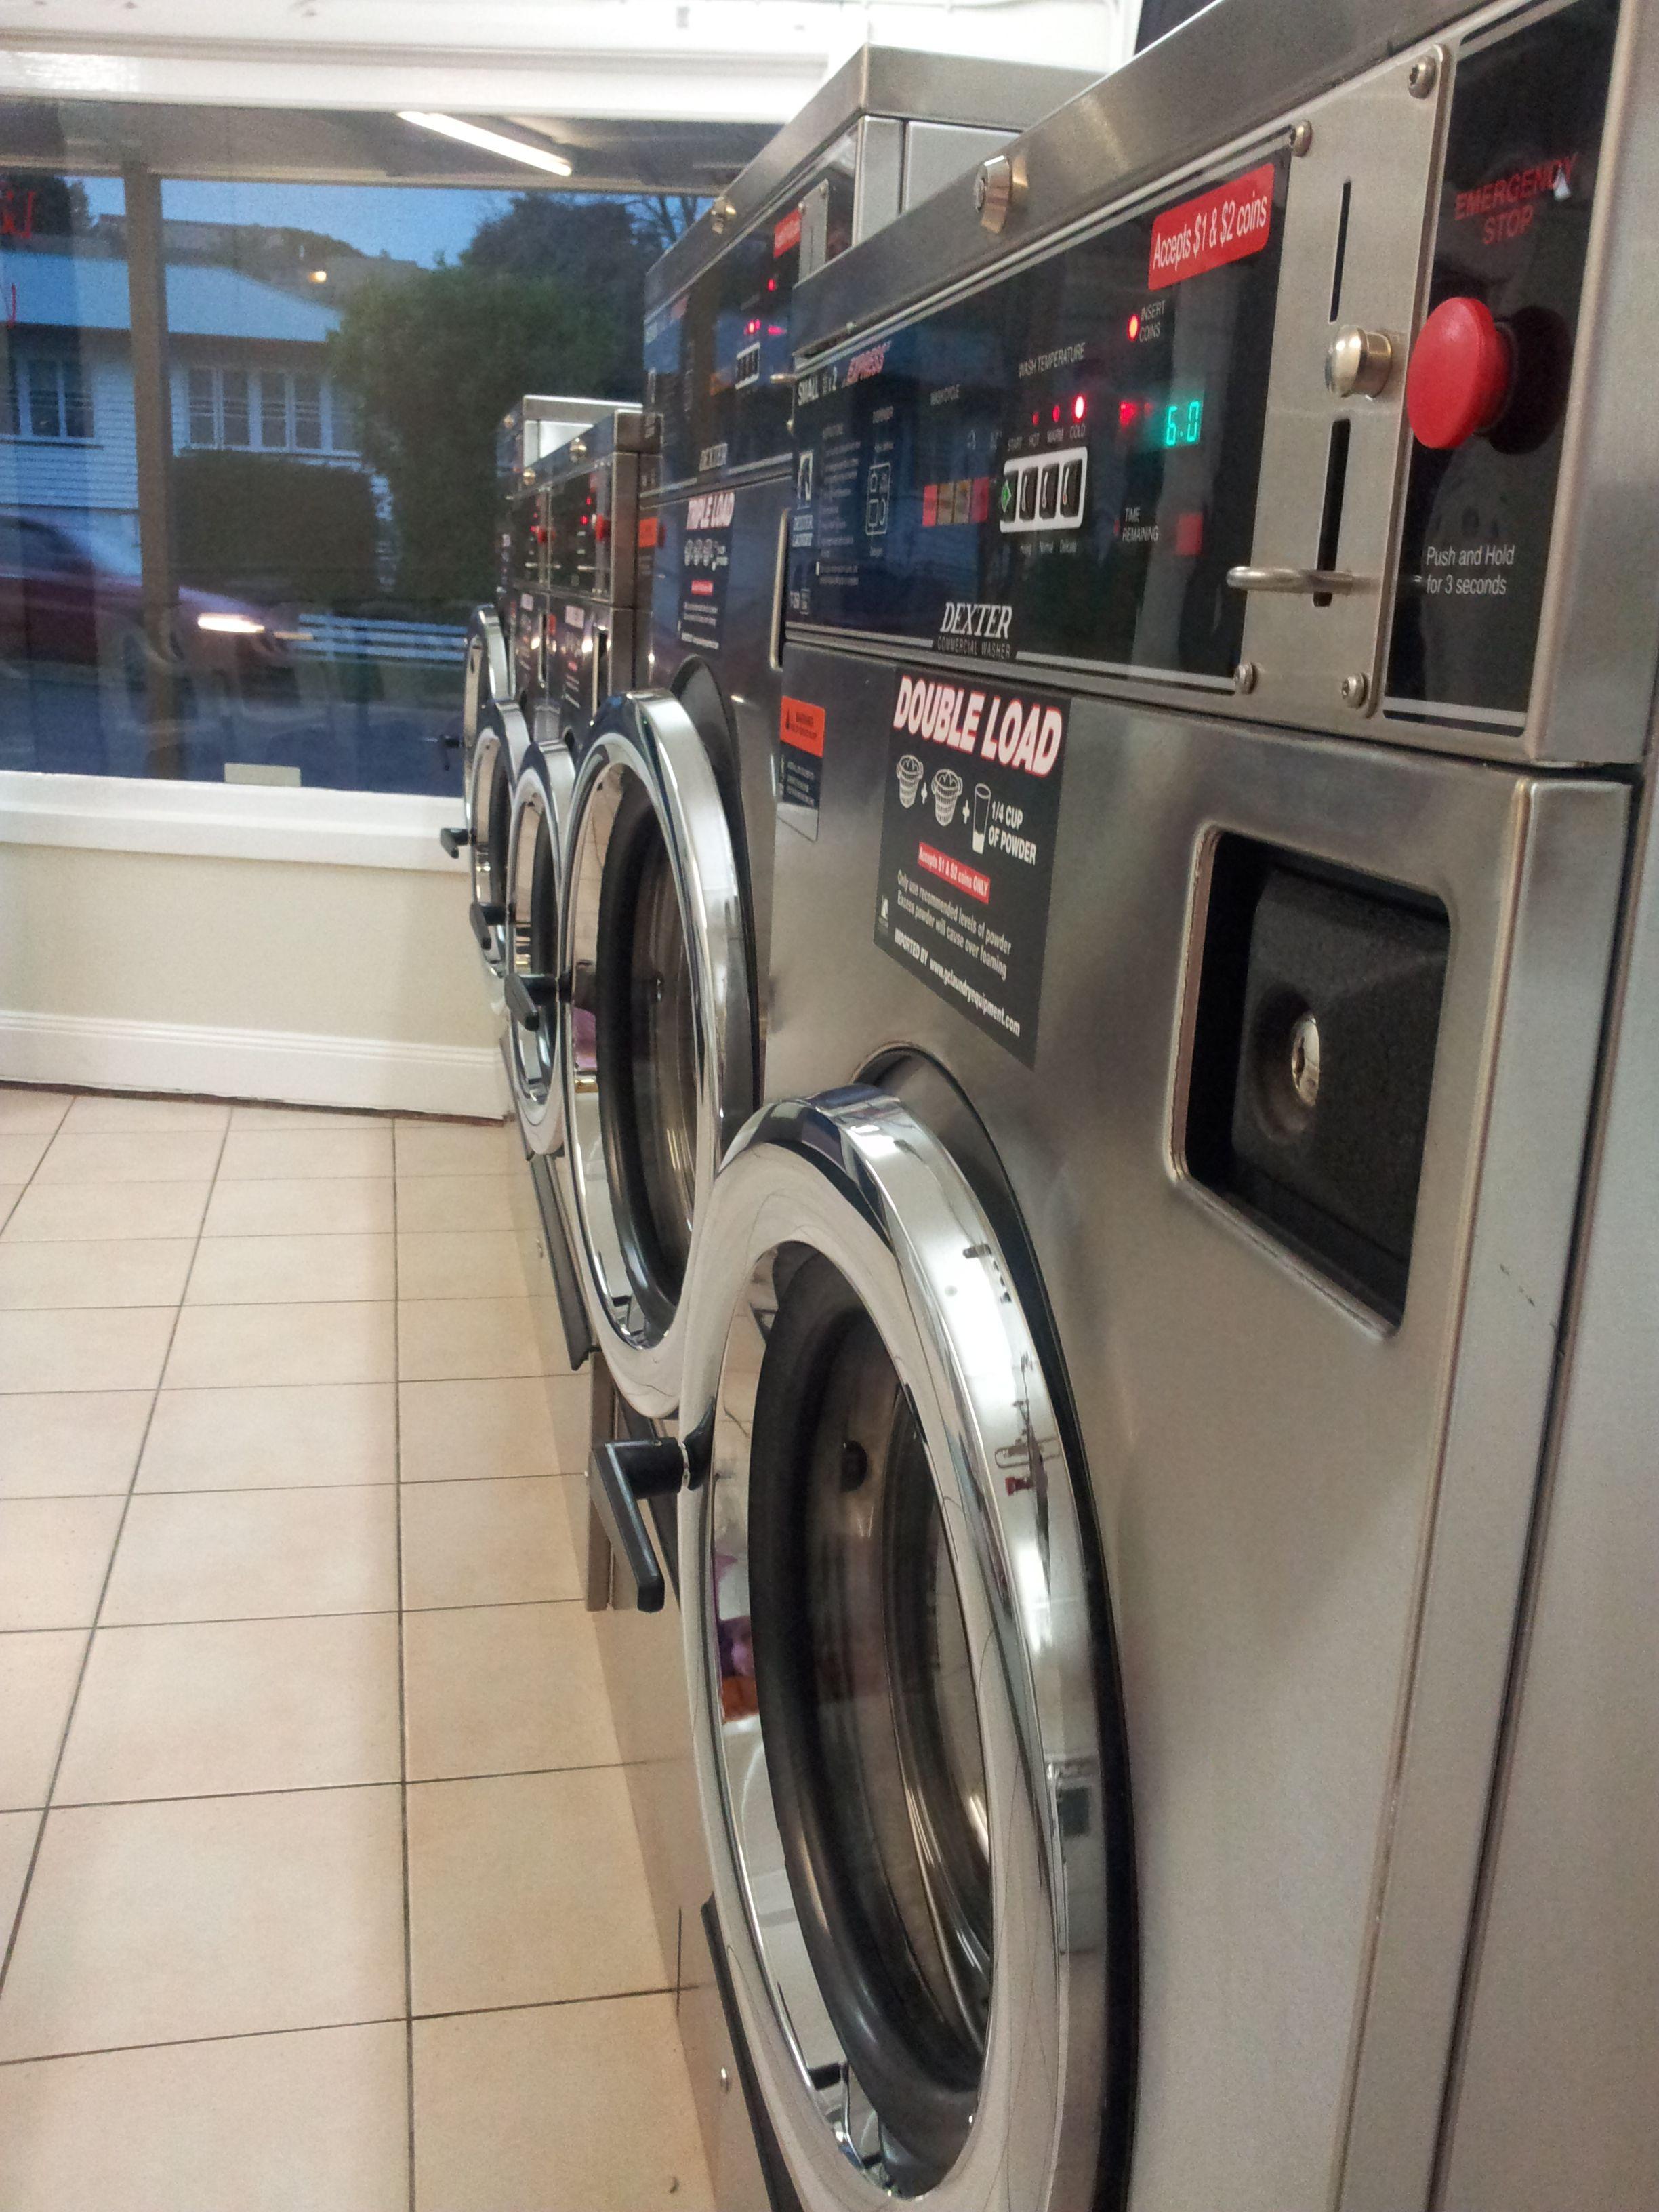 Dexter Express Washers At Indooroopilly Laundromat In Taringa Brisbane Australia Indooroopilly Brisbane Australia Laundromat Self Service Laundry